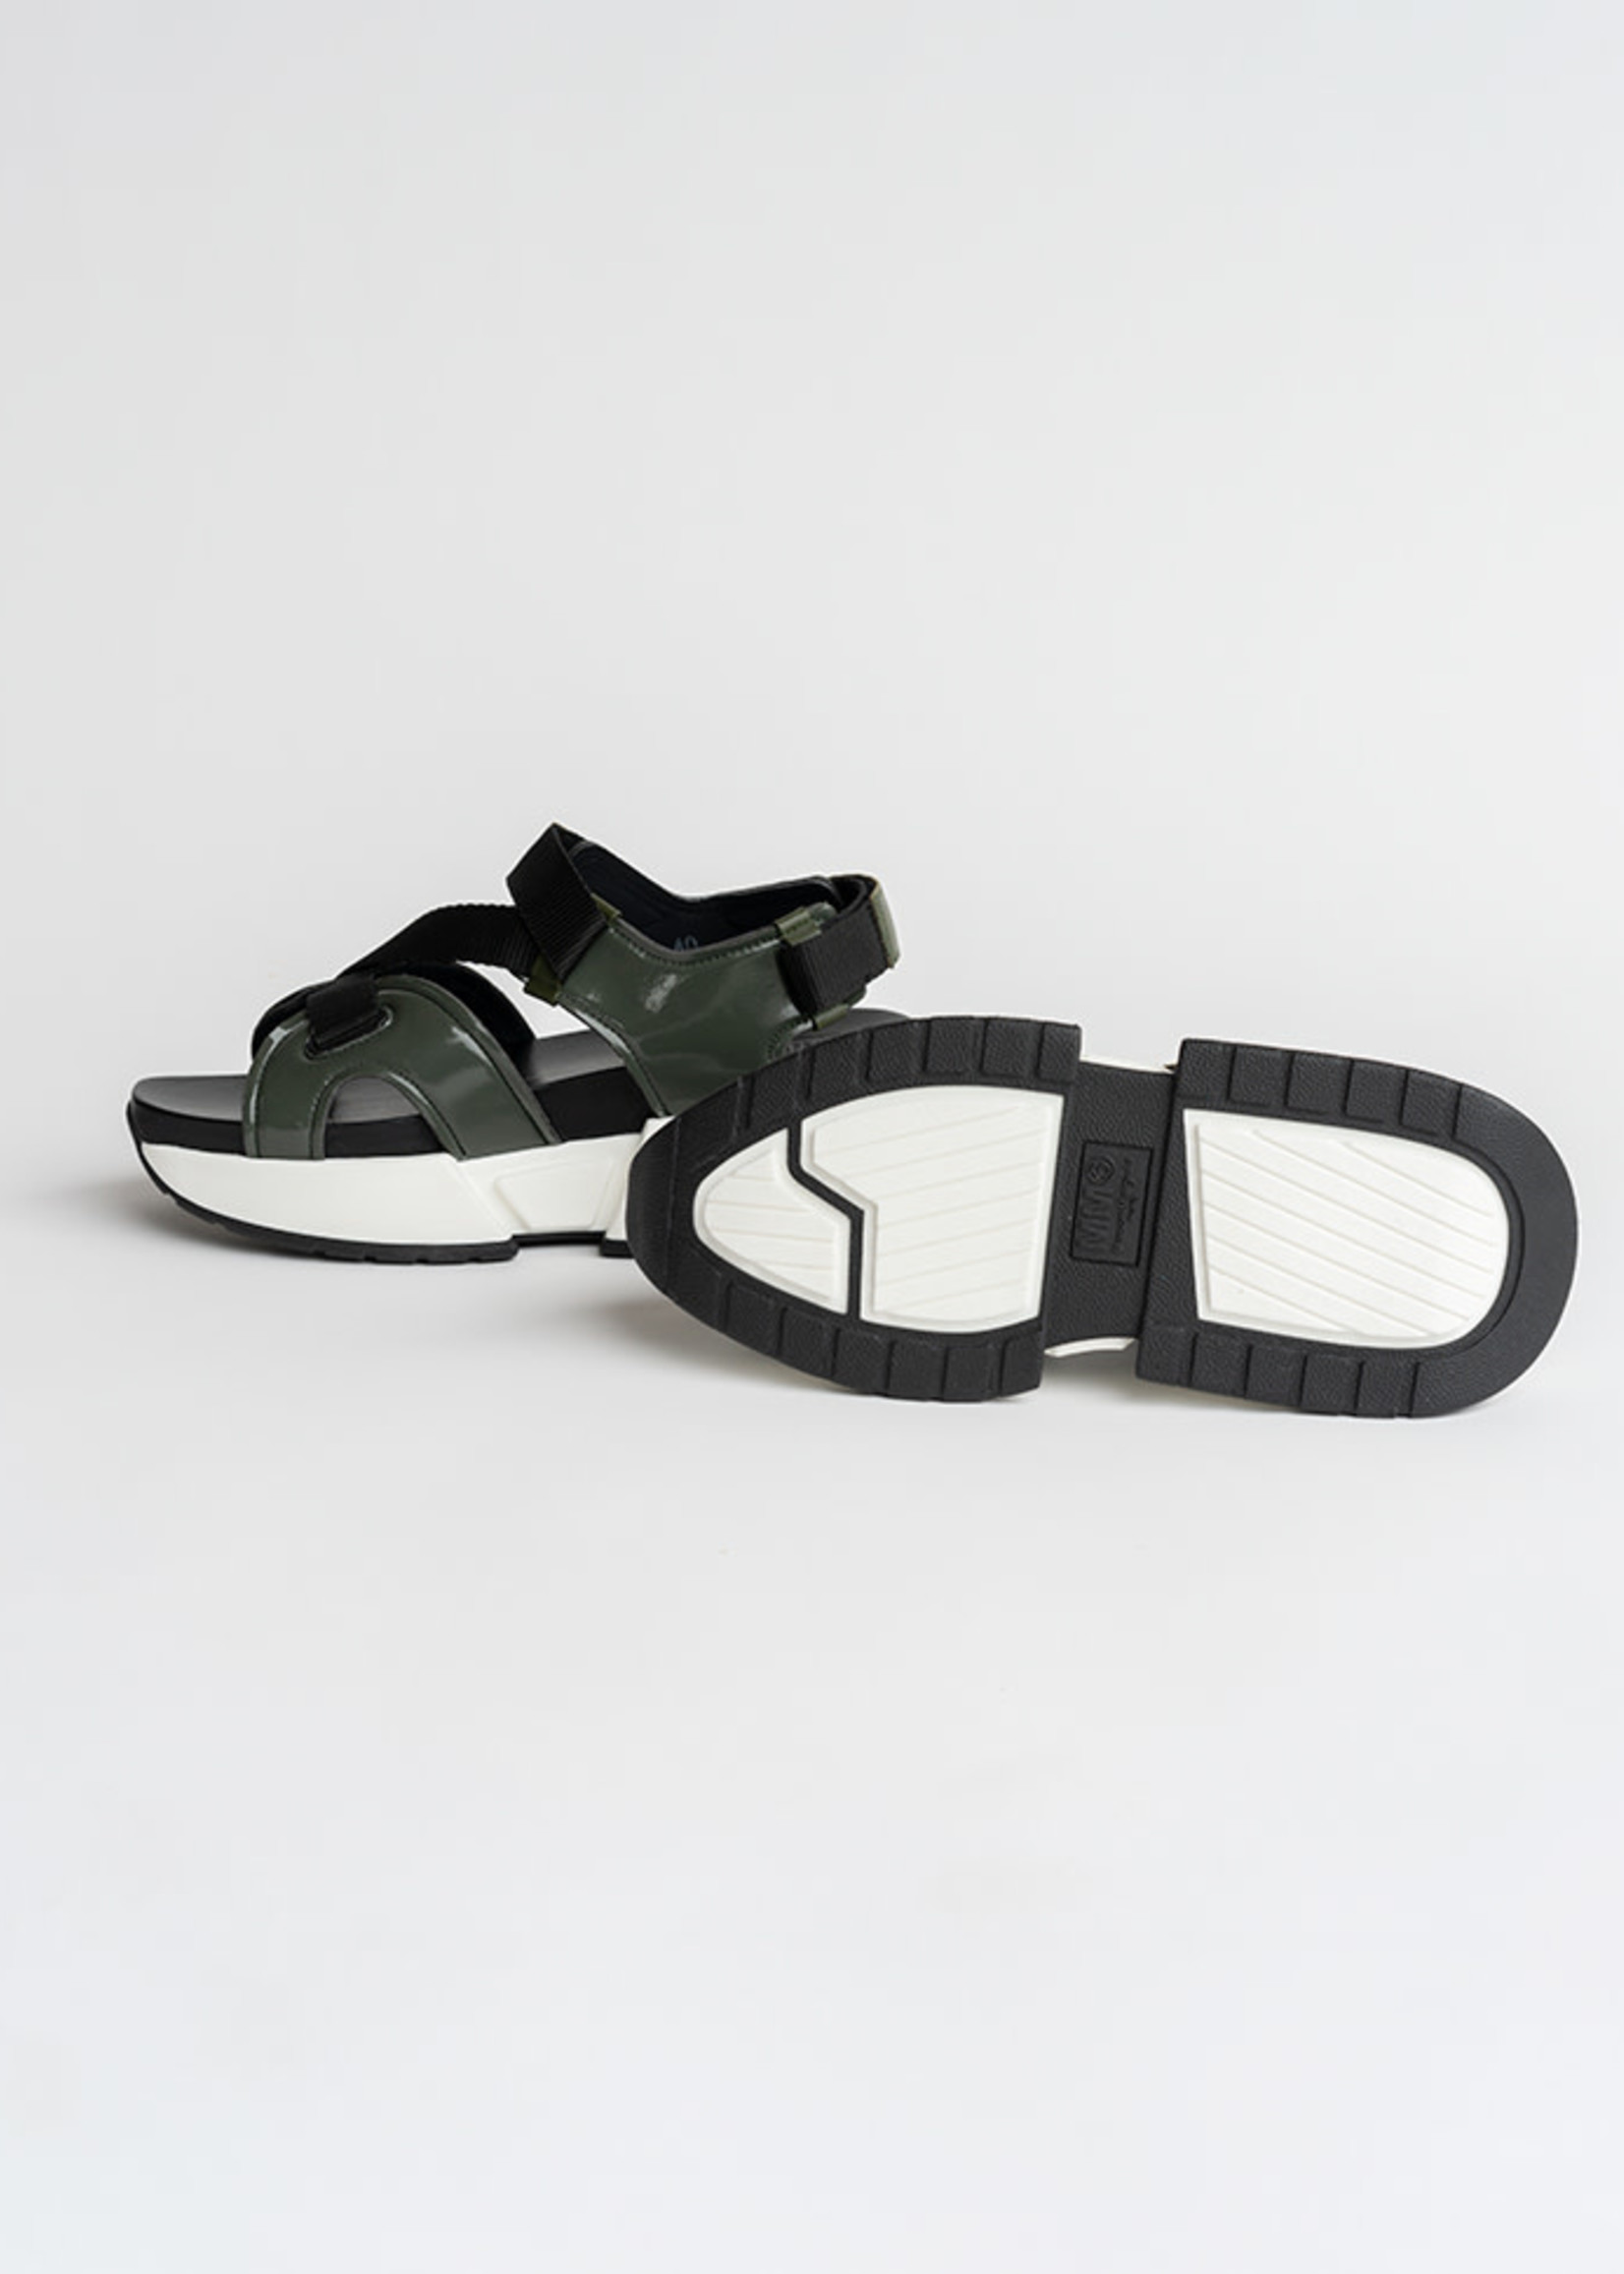 MM6 MAISON MARGIELA Military Green Multi Strap Sandals